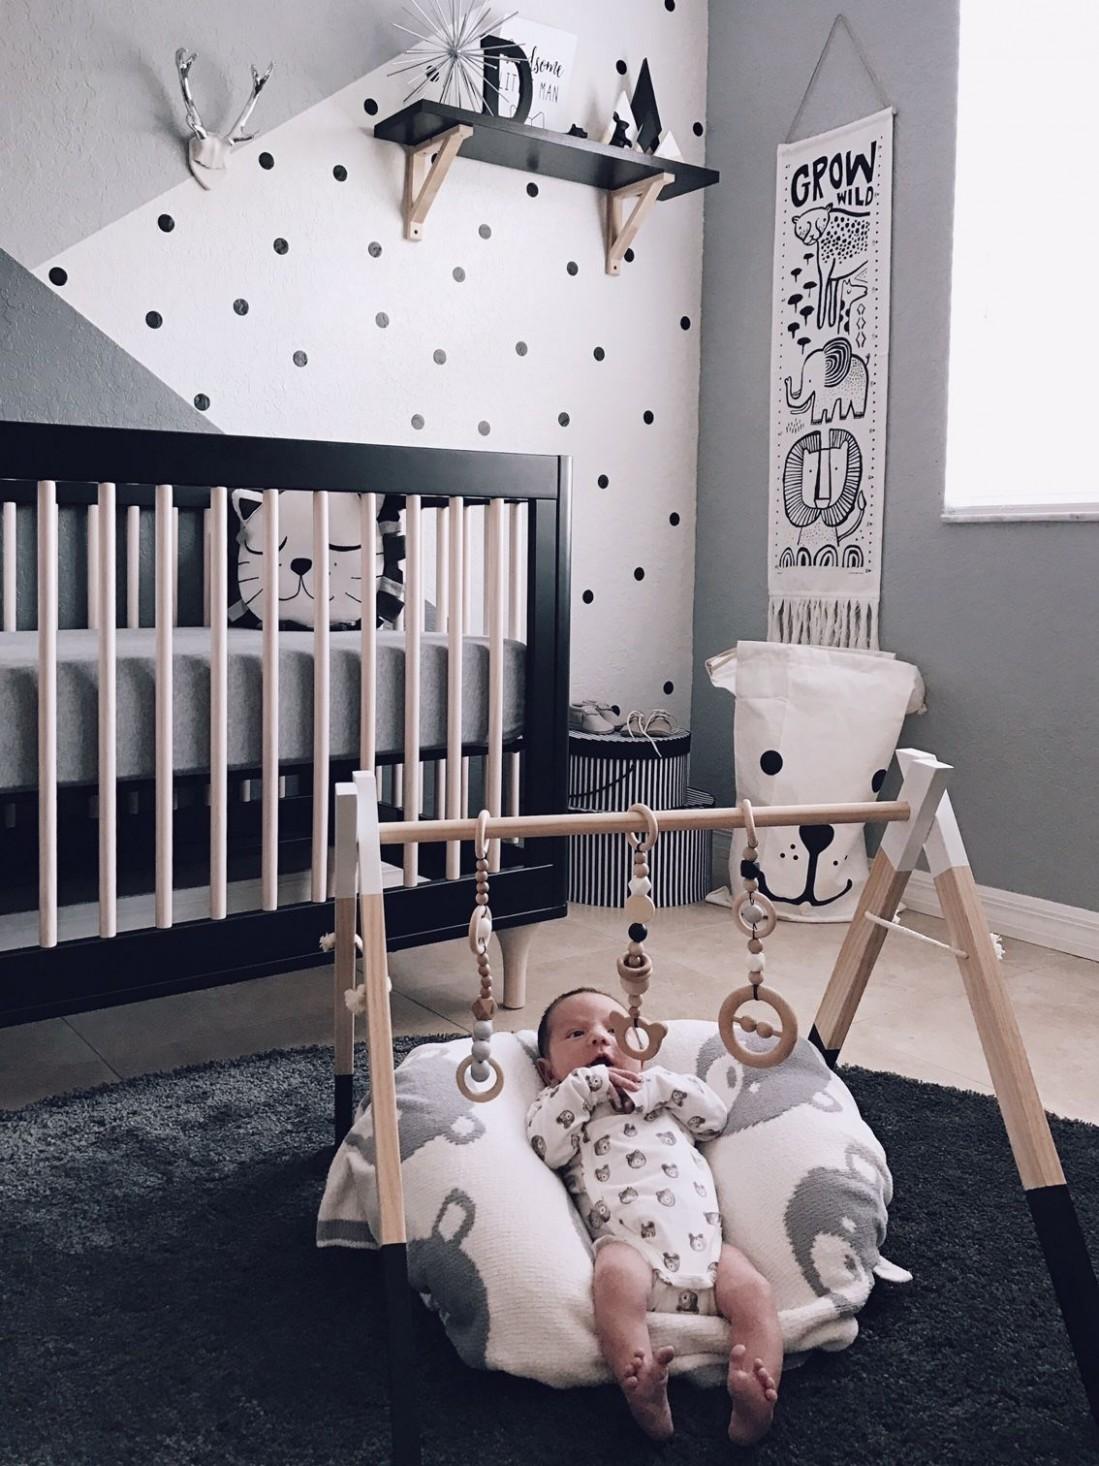 Monochrome Zoo Nursery - Project Nursery  Baby boy room decor  - Baby Room Pinterest